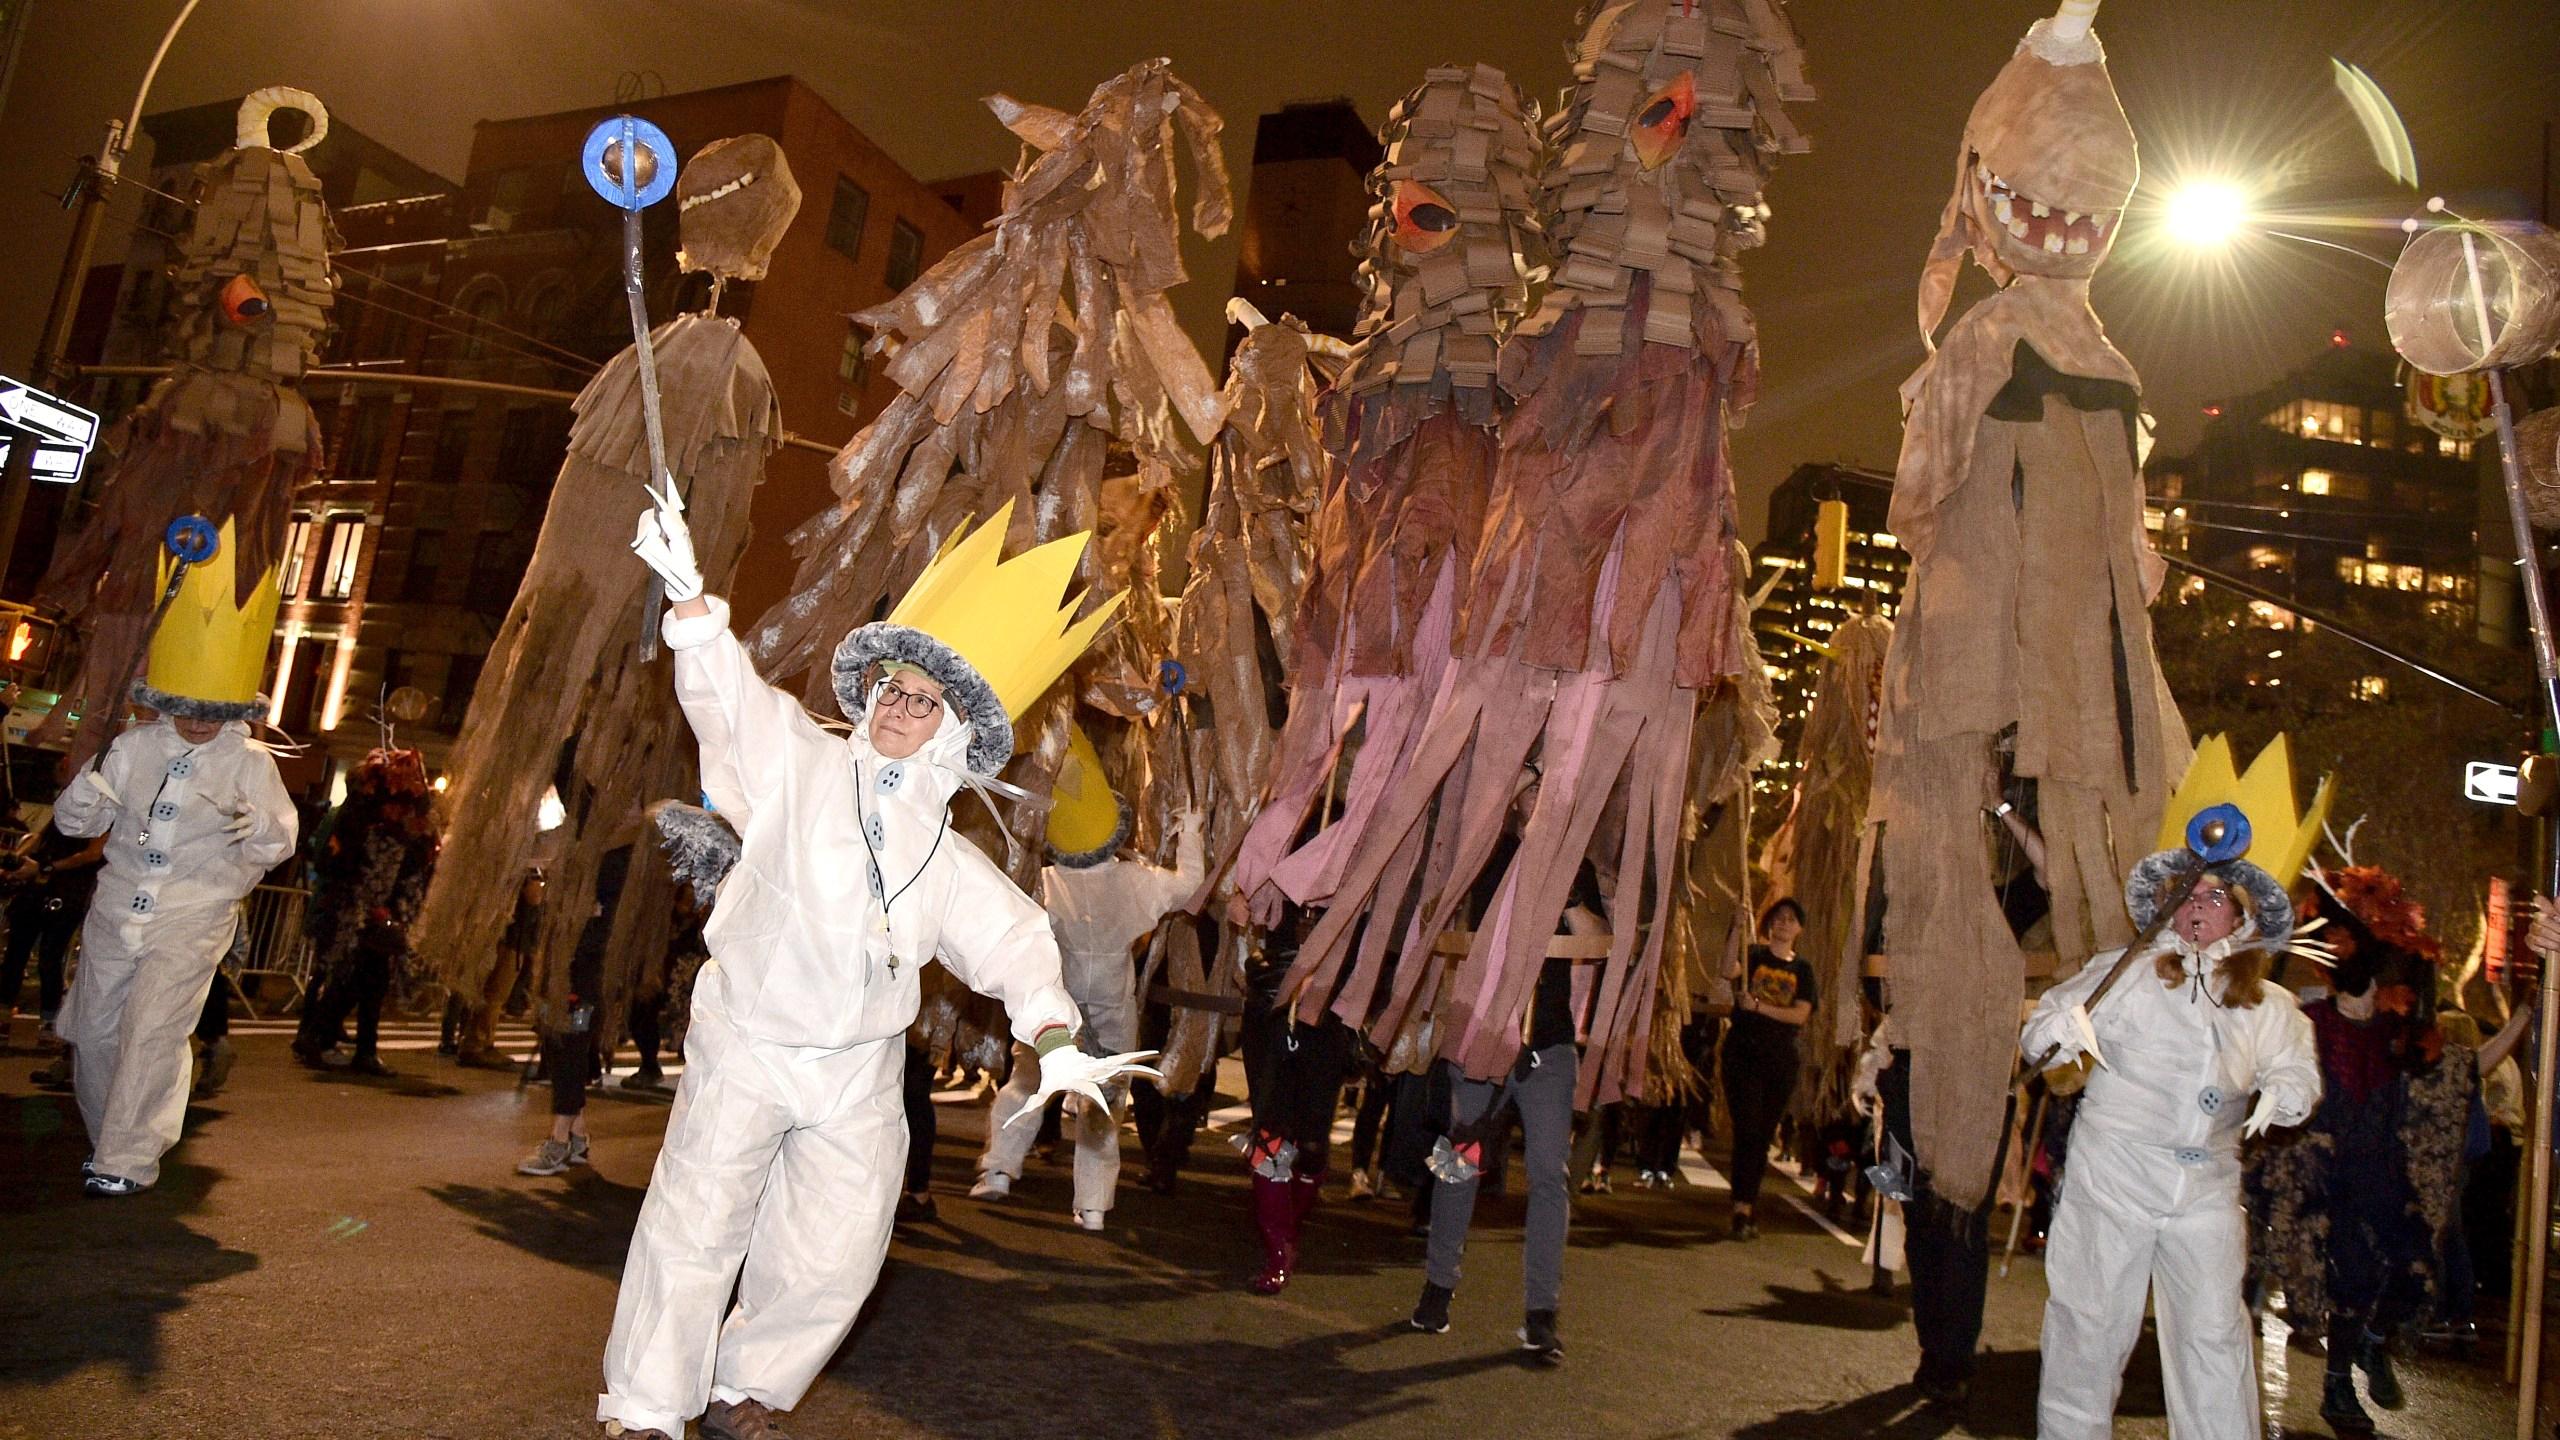 Photos: Photos: Costumed revelers kick off 46th NYC Halloweenparade